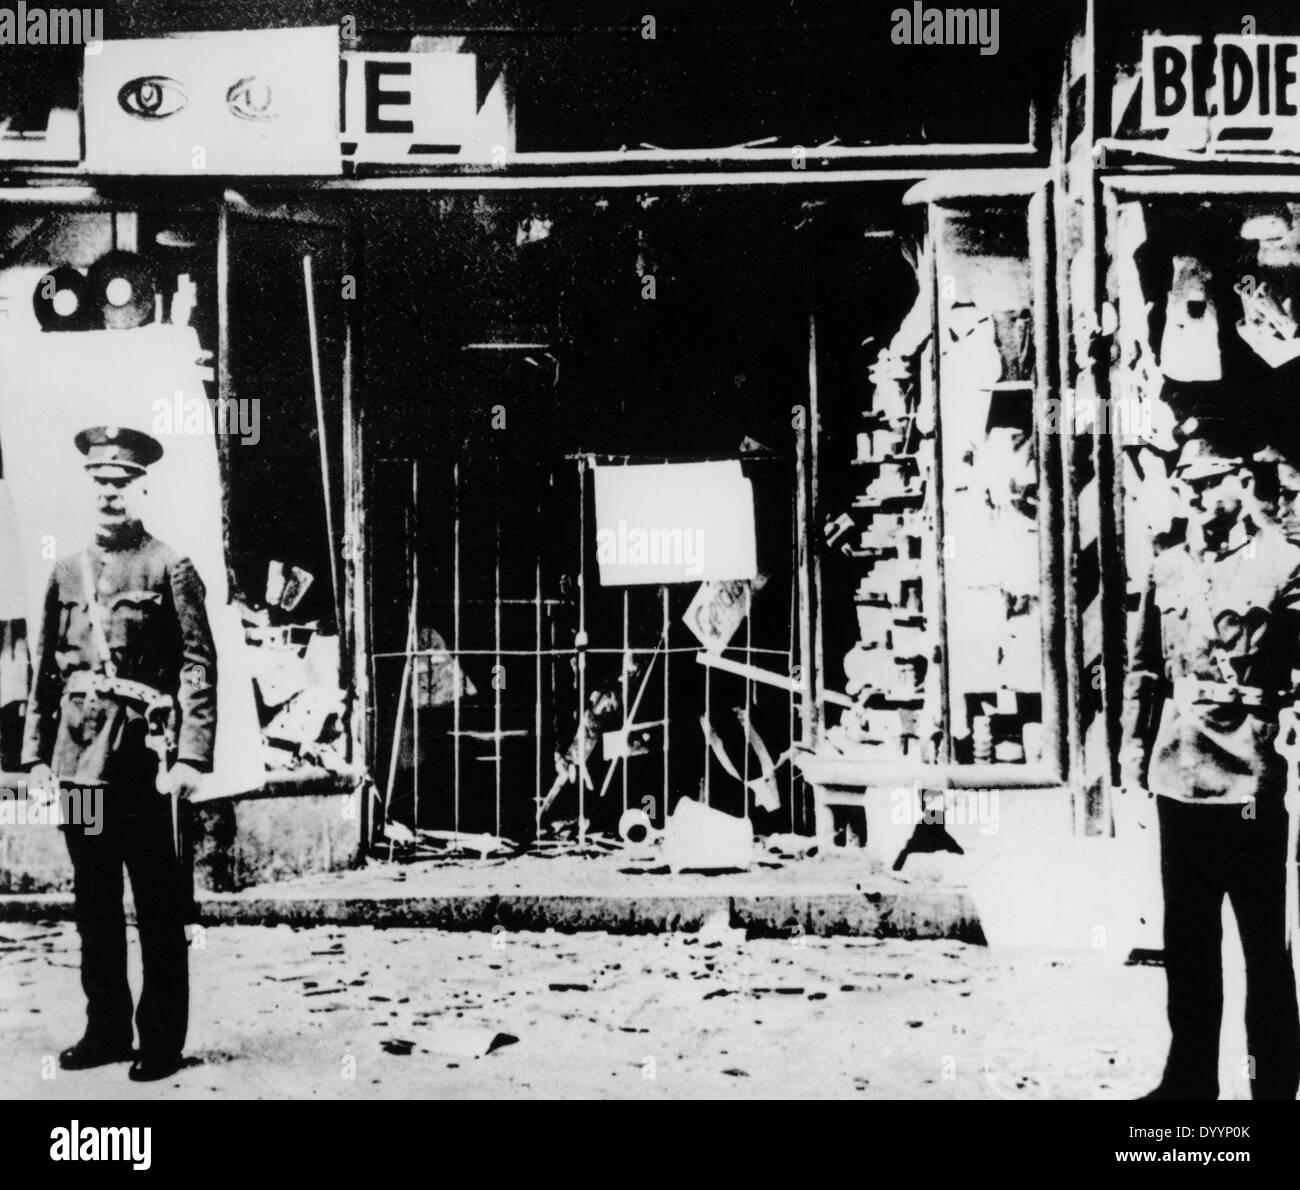 Demolished Jewish store in Vienna, 1938 - Stock Image